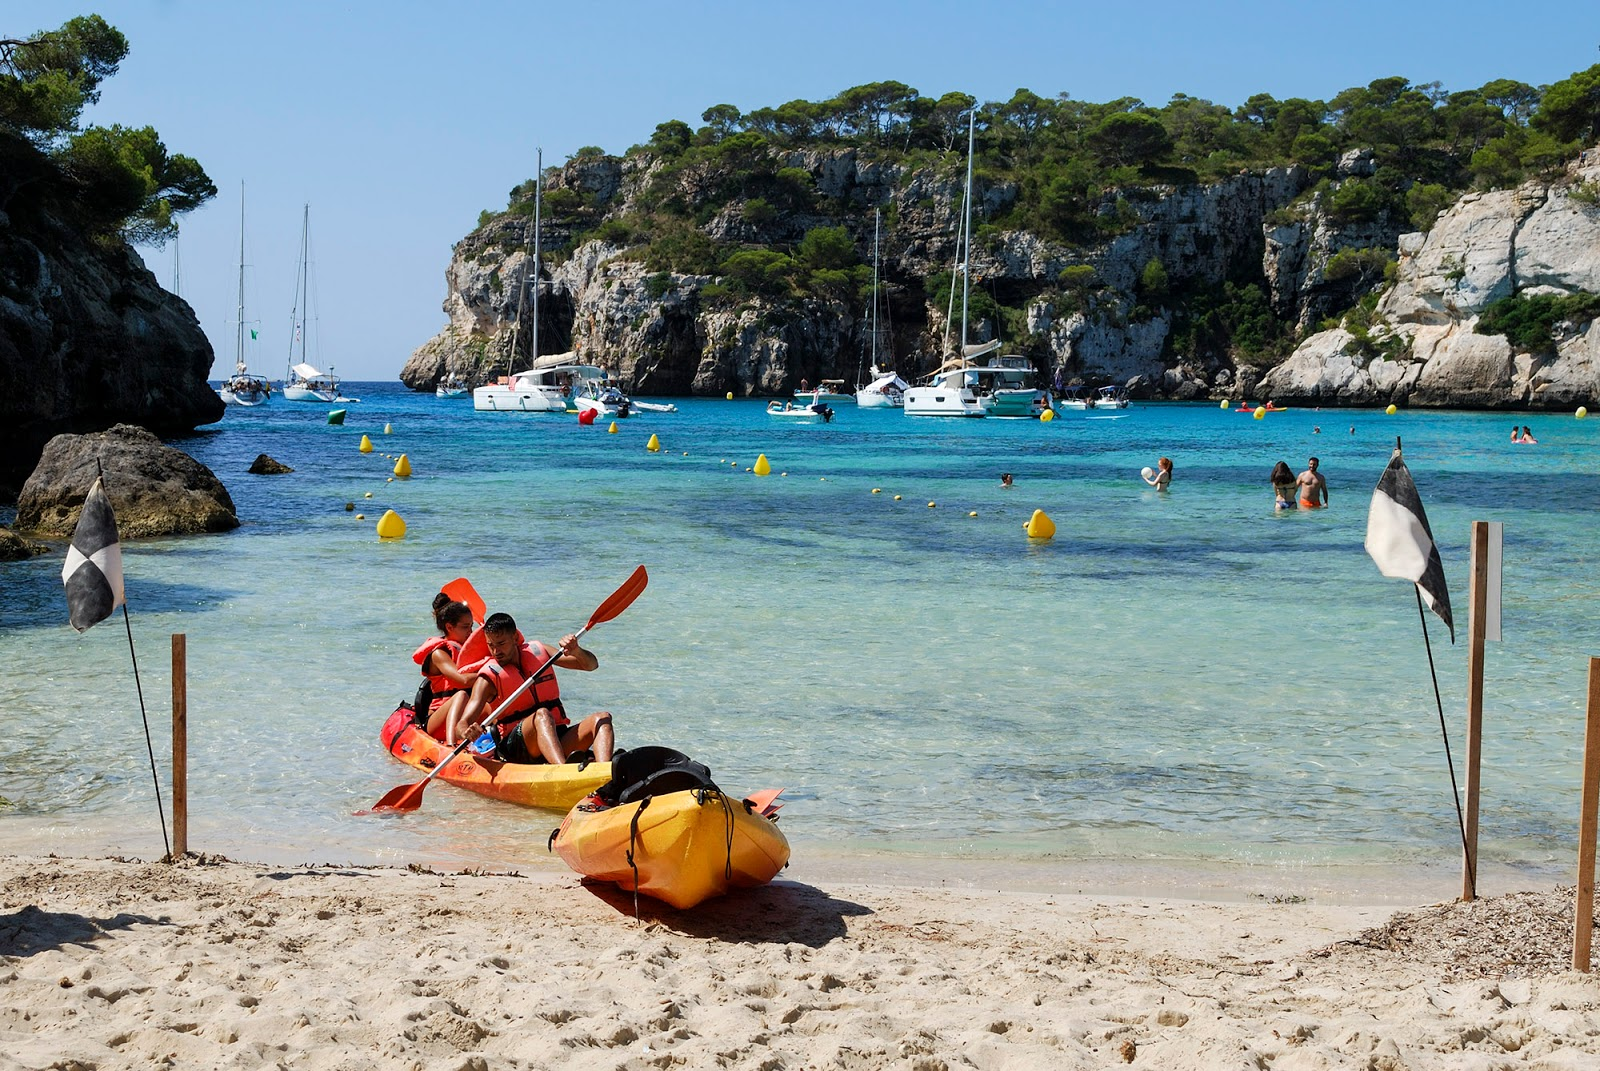 Cala Macarella Menorca Spain kayak itinerary what to do